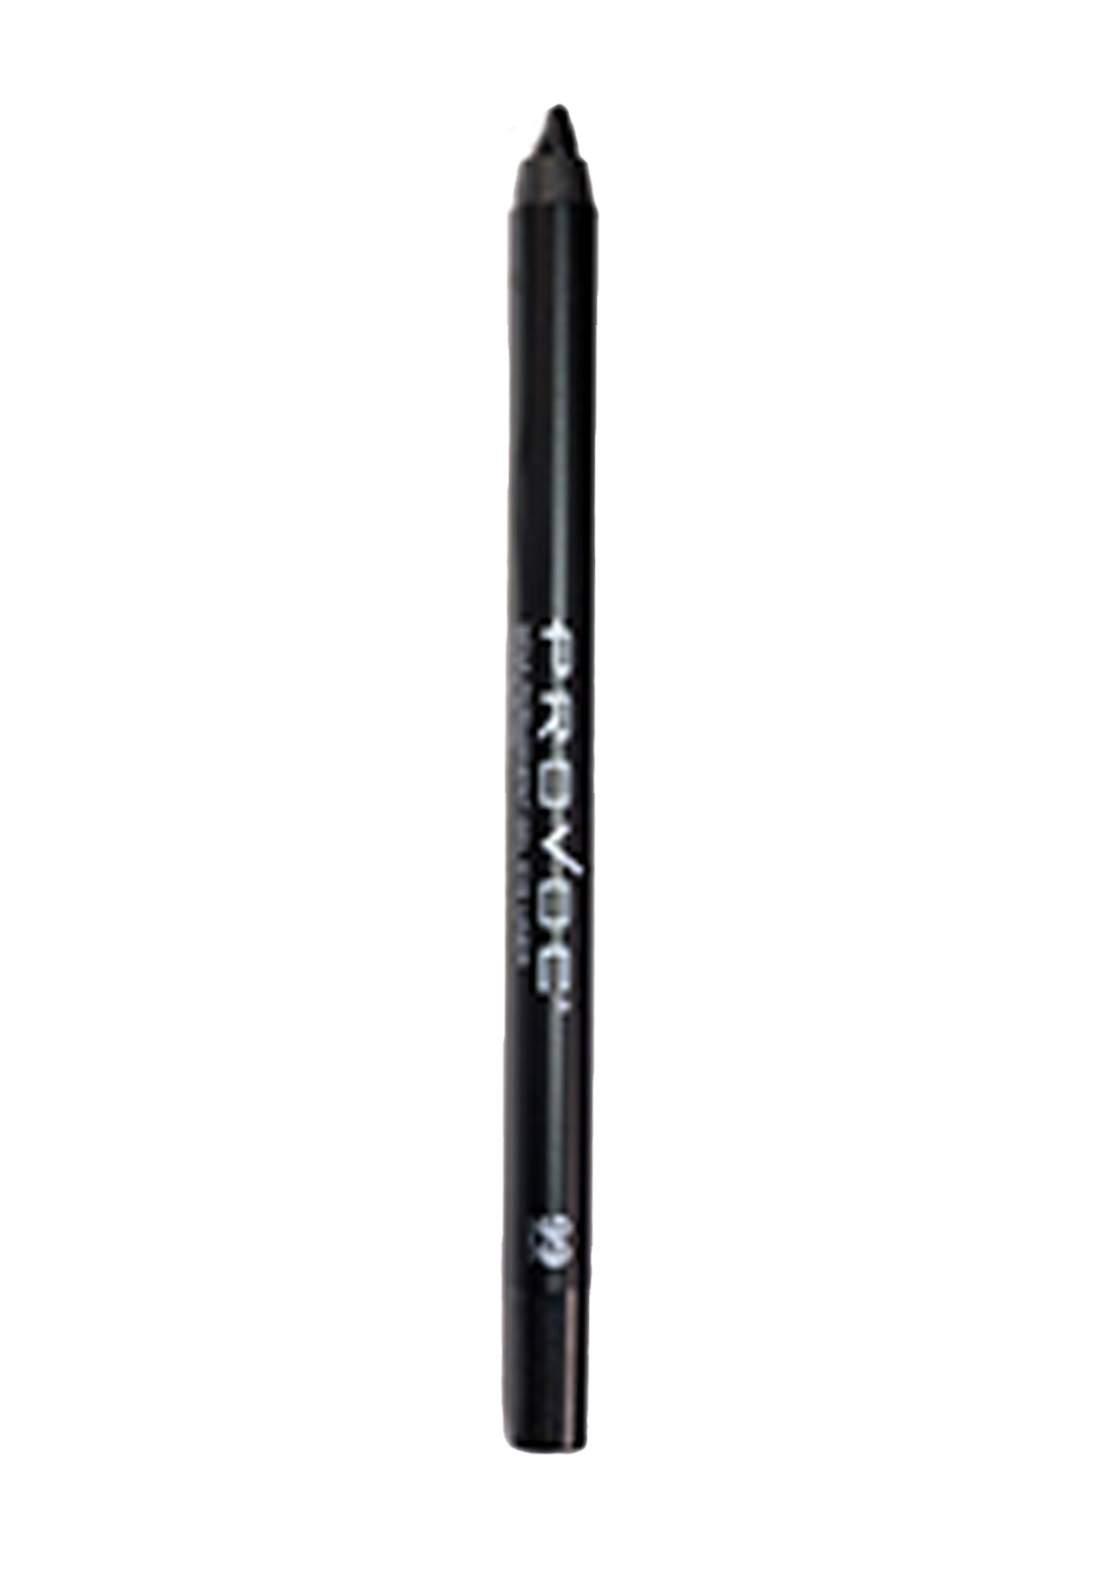 Provoc 353-0066 Semi-Permanent Gel Eye Liner Pencil No.99 قلم محدد العيون